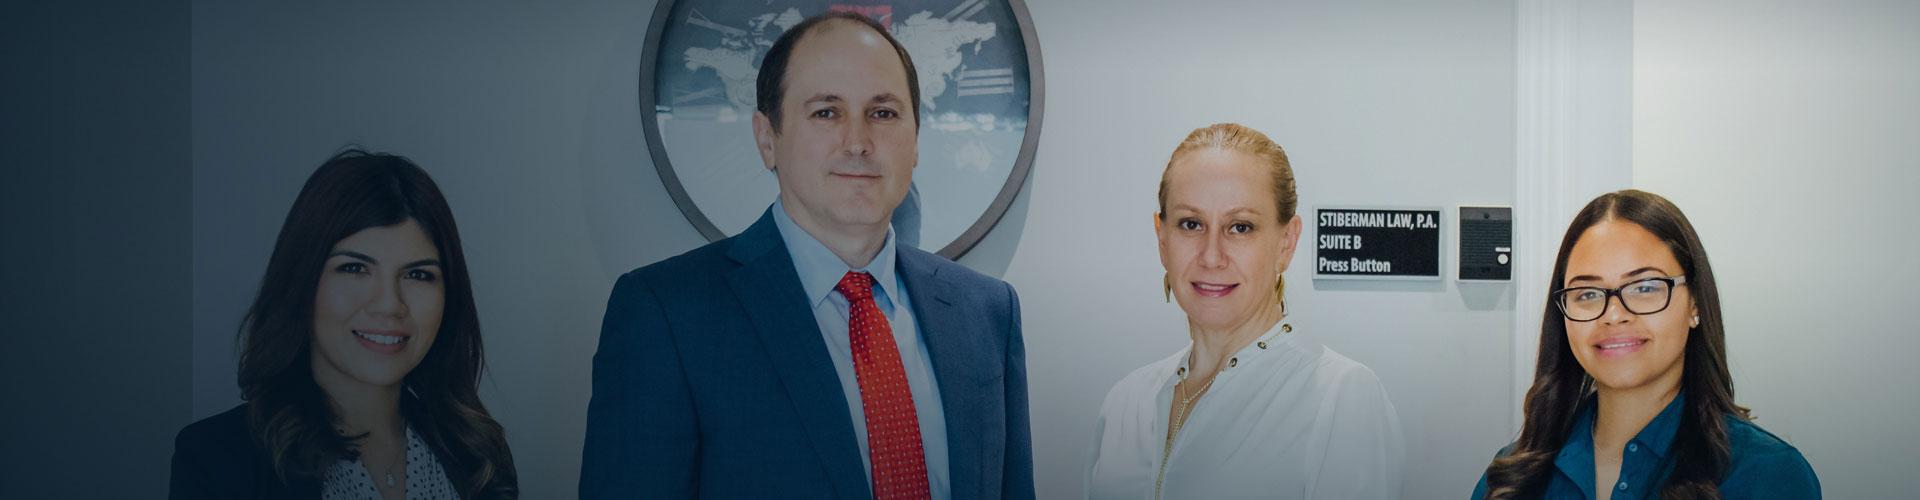 Broward Loan Modification Attorneys - Stiberman Law Firm